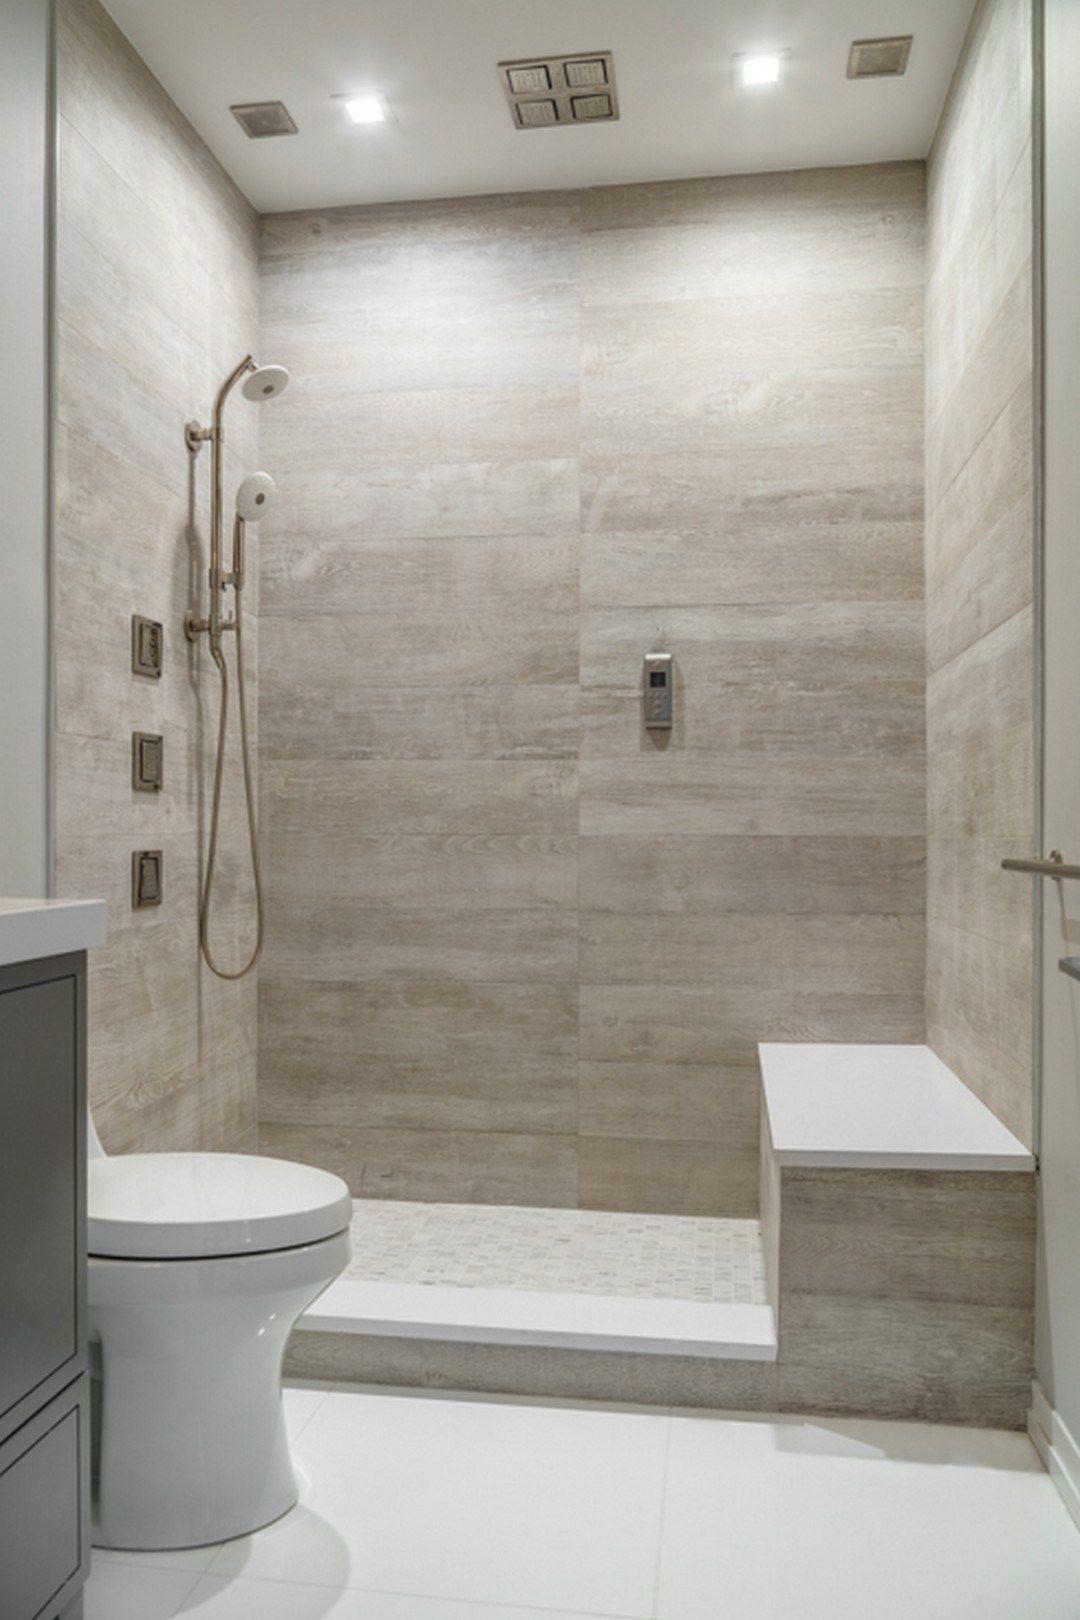 Find And Save Ideas Bathroom Tile Design